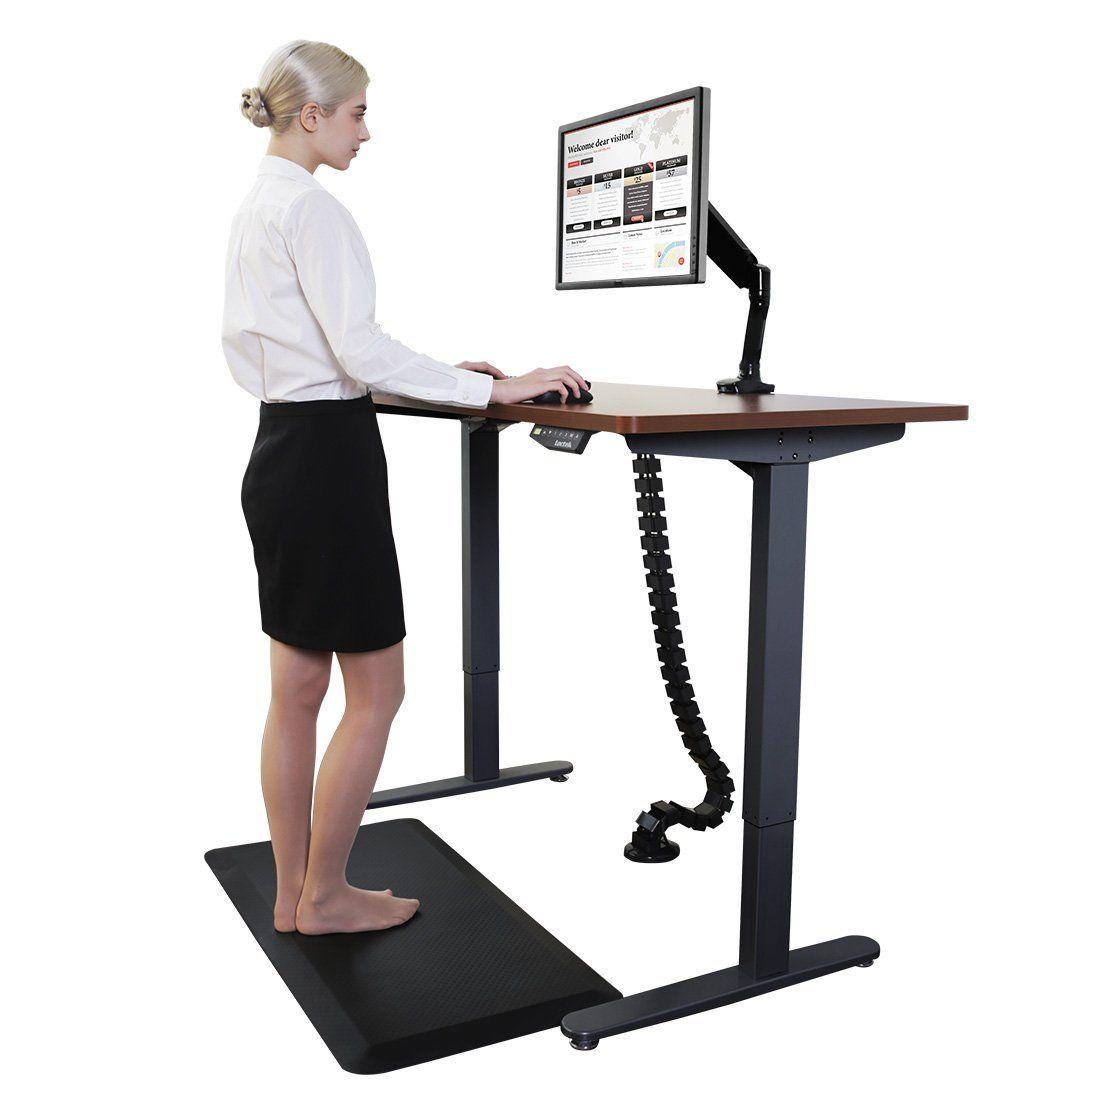 Amazon.com: FlexiSpot Standing Desk Mat 20 in x 39 in Non-Slip ...